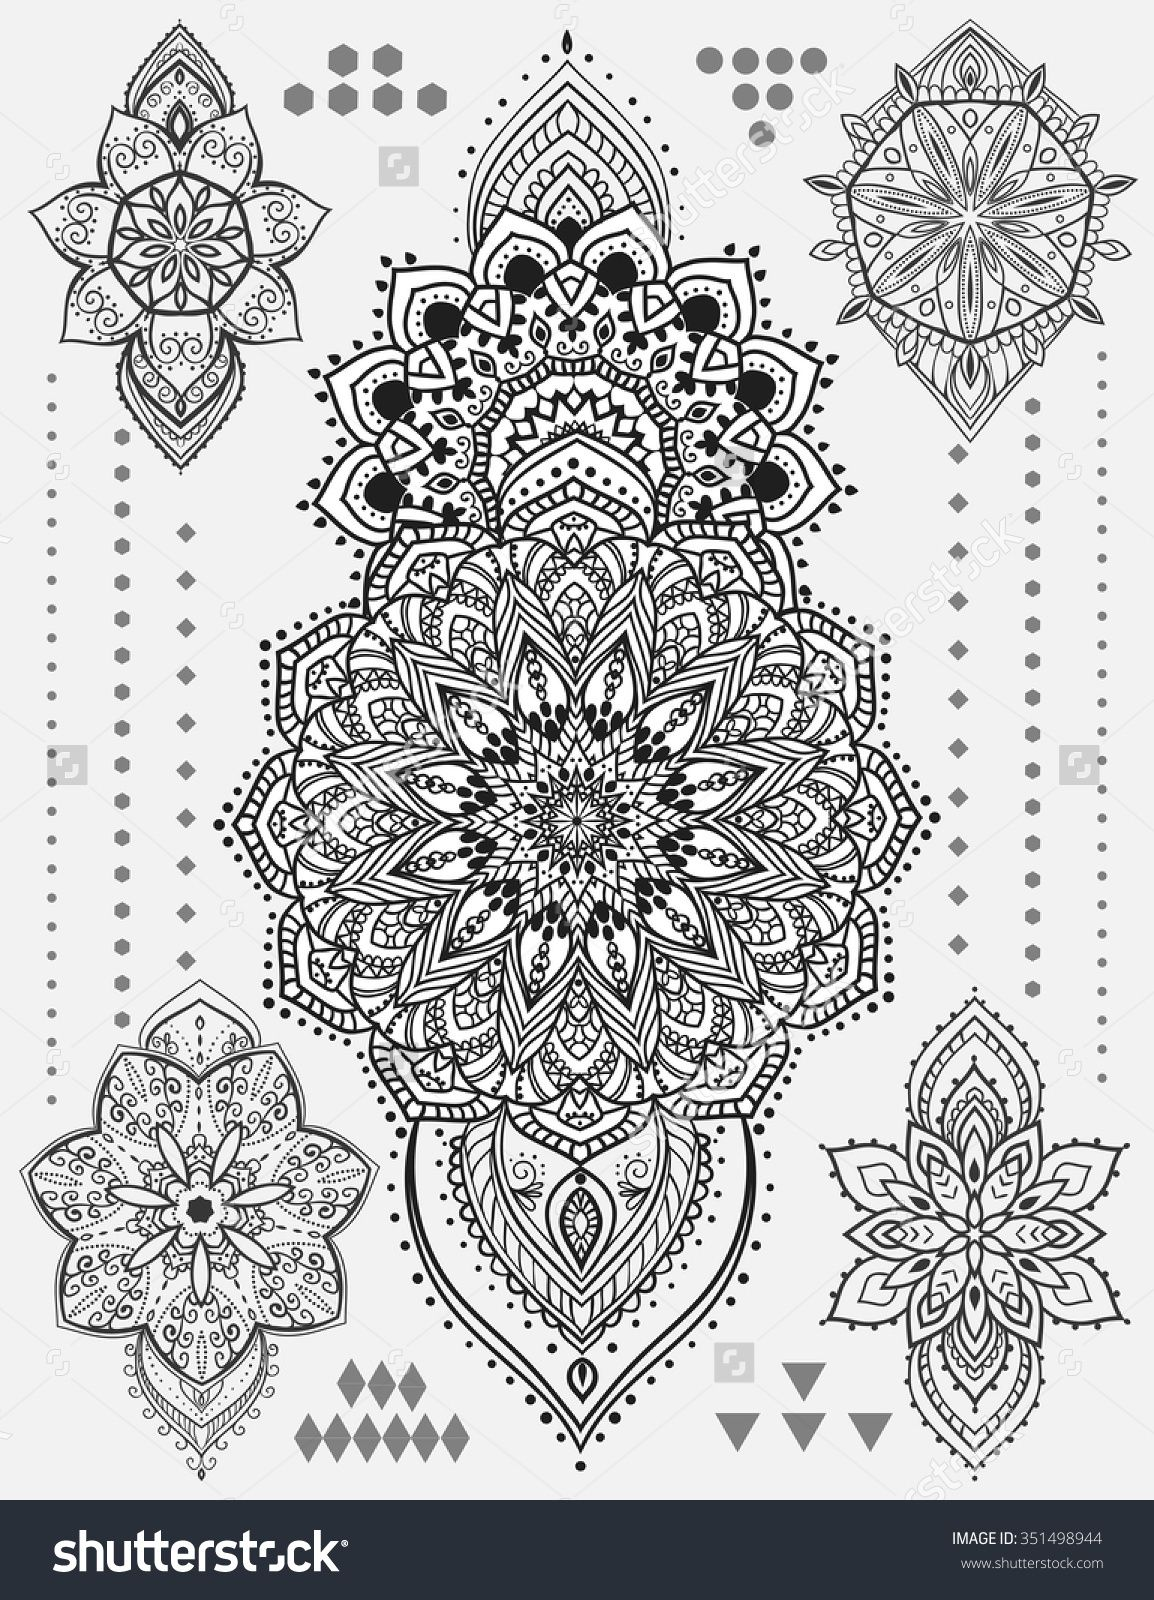 Oblong Mandala Coloring Page Mandala Set And Other Elements Vector Mandala Tattoo Perfect For Mandala Coloring Pages Mandala Tattoo Pattern Tattoo